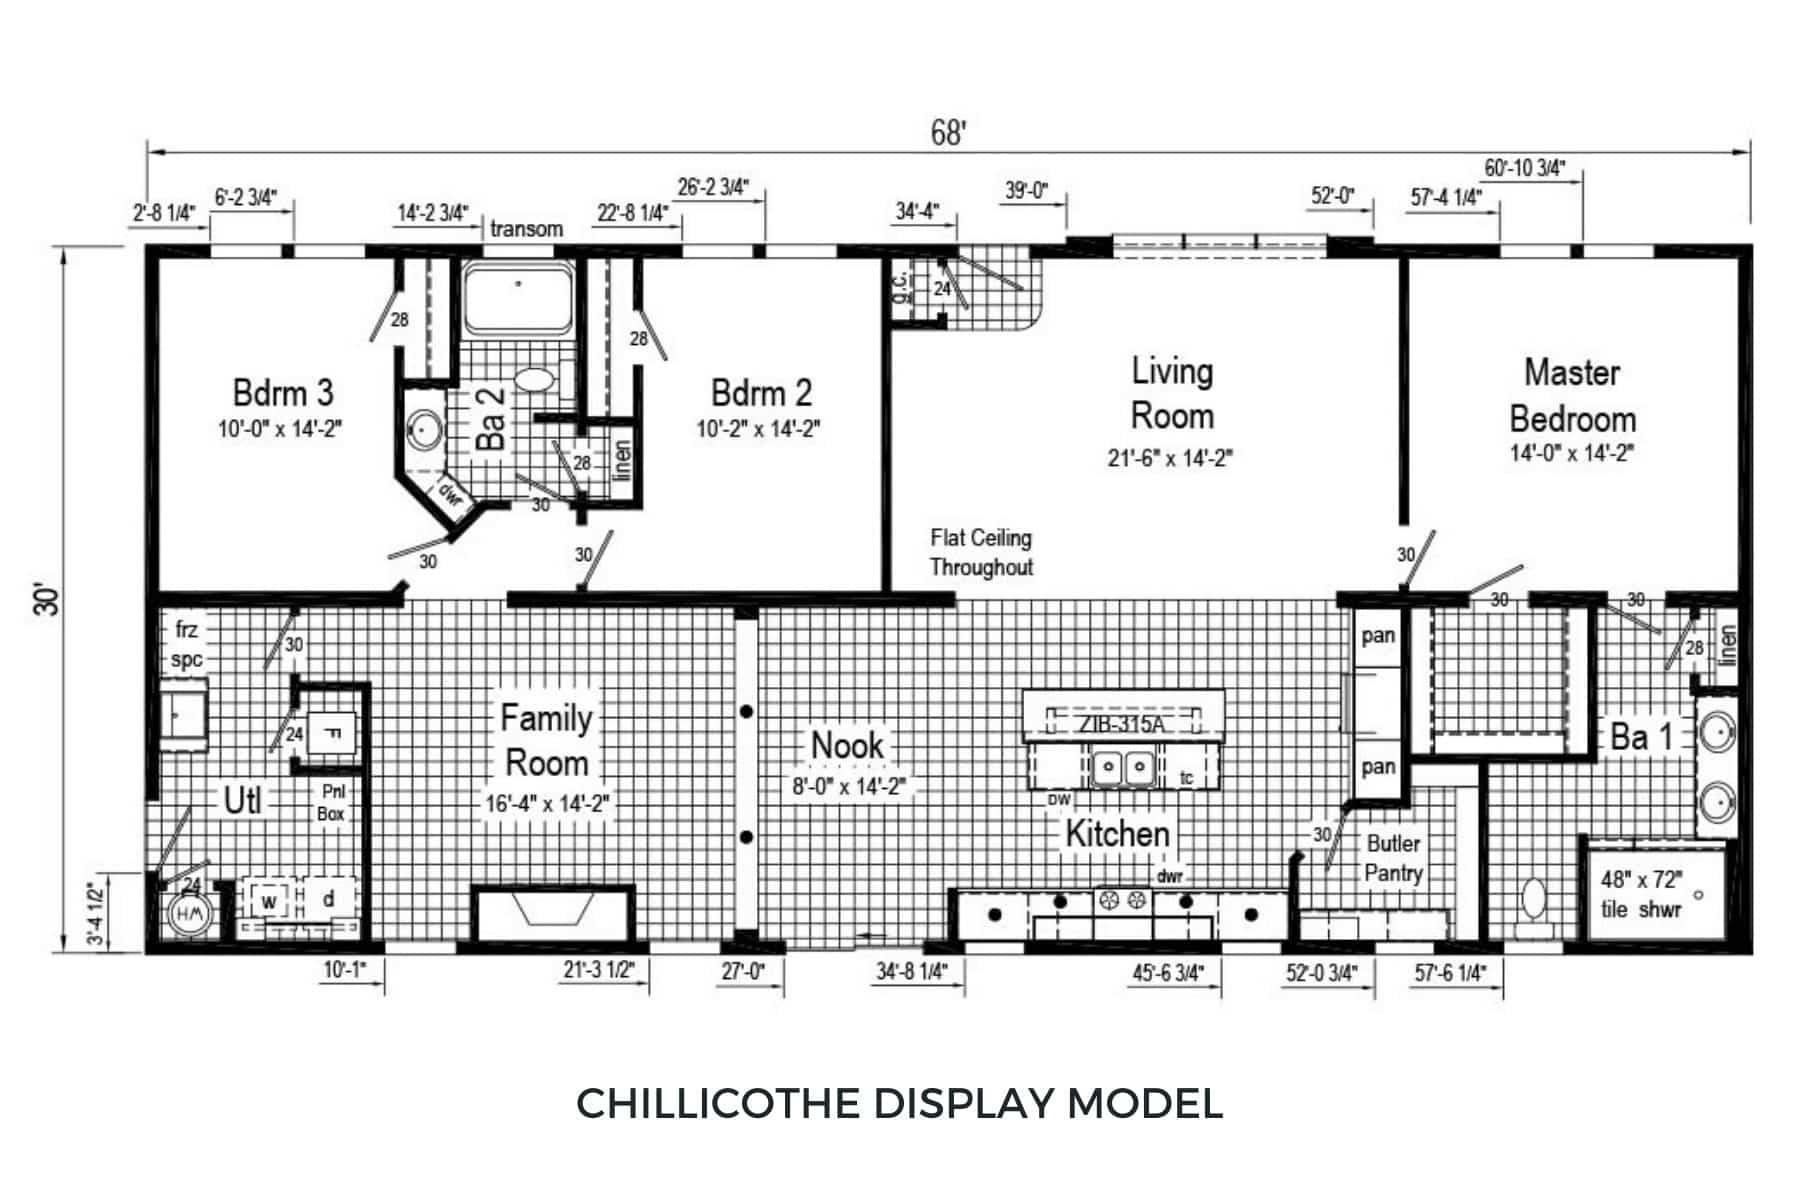 Commodore-Douglas-RX-765-Chillicothe-Floor-Plan-1